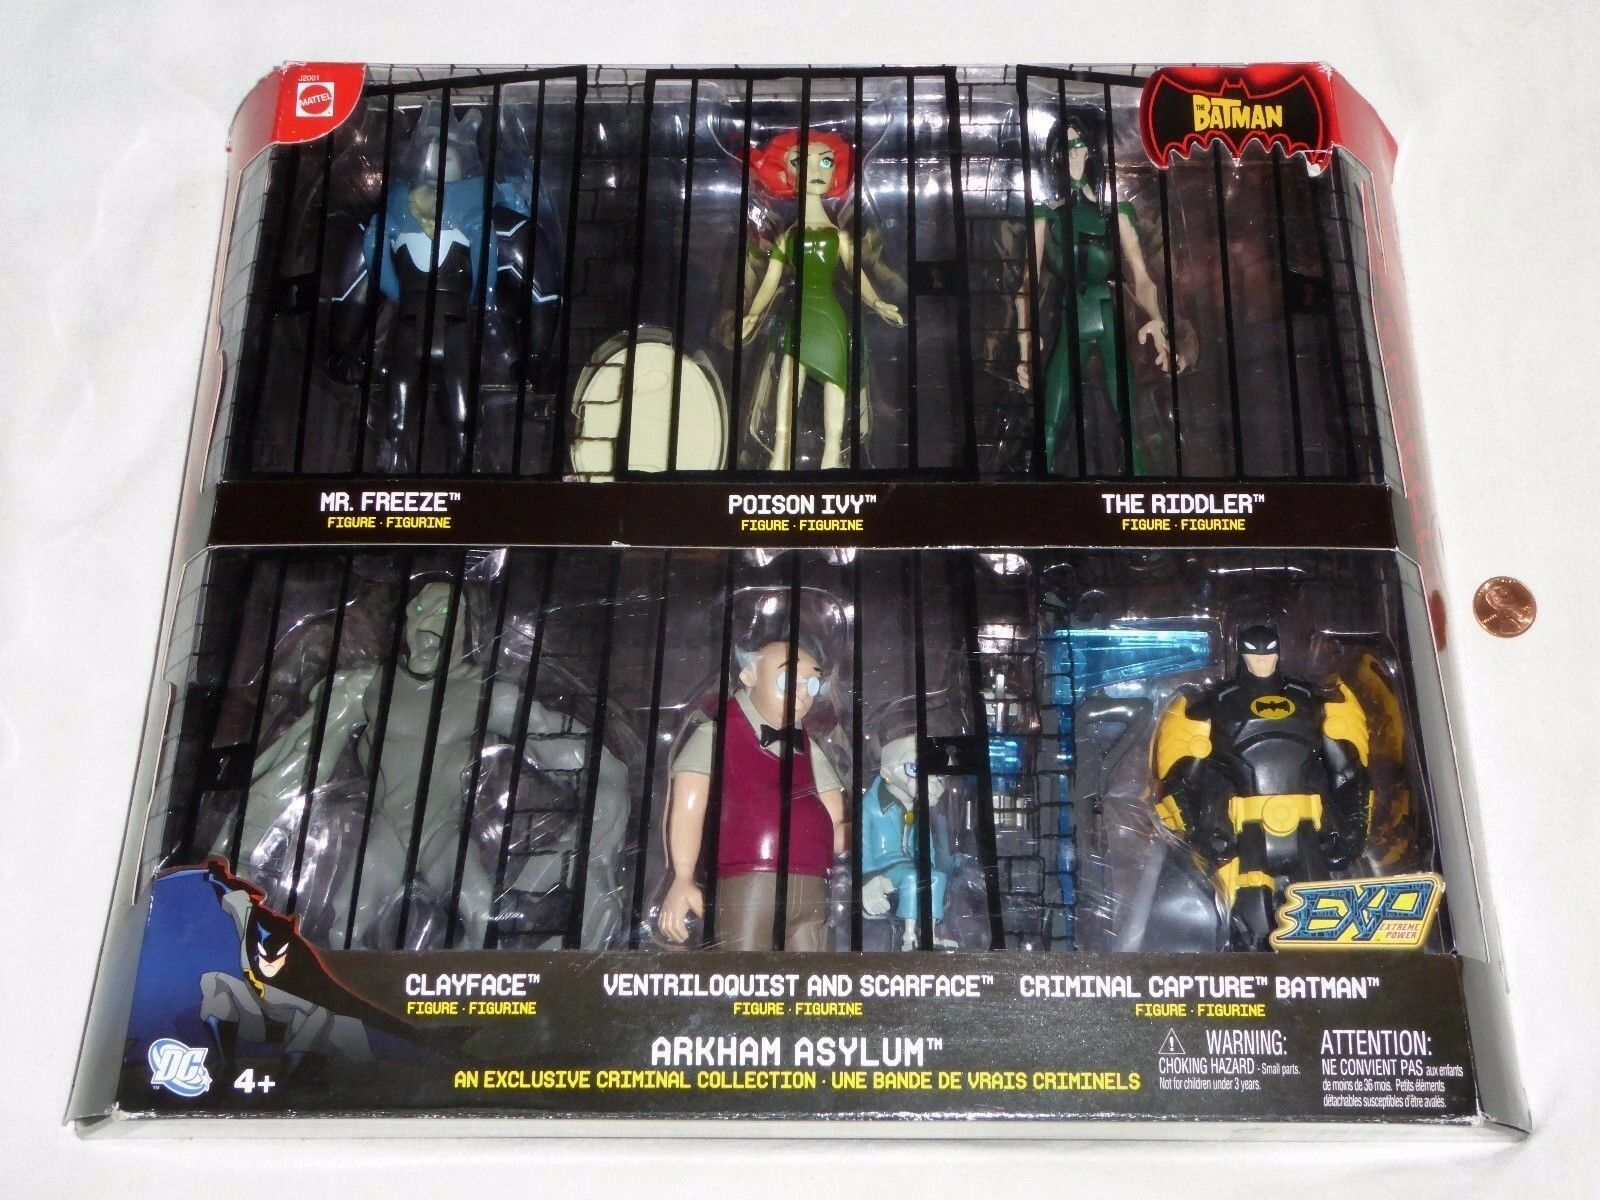 Neuf Batman Arkham Asylum Exclusive criminel collection 6 Figure Set Avec Scarface